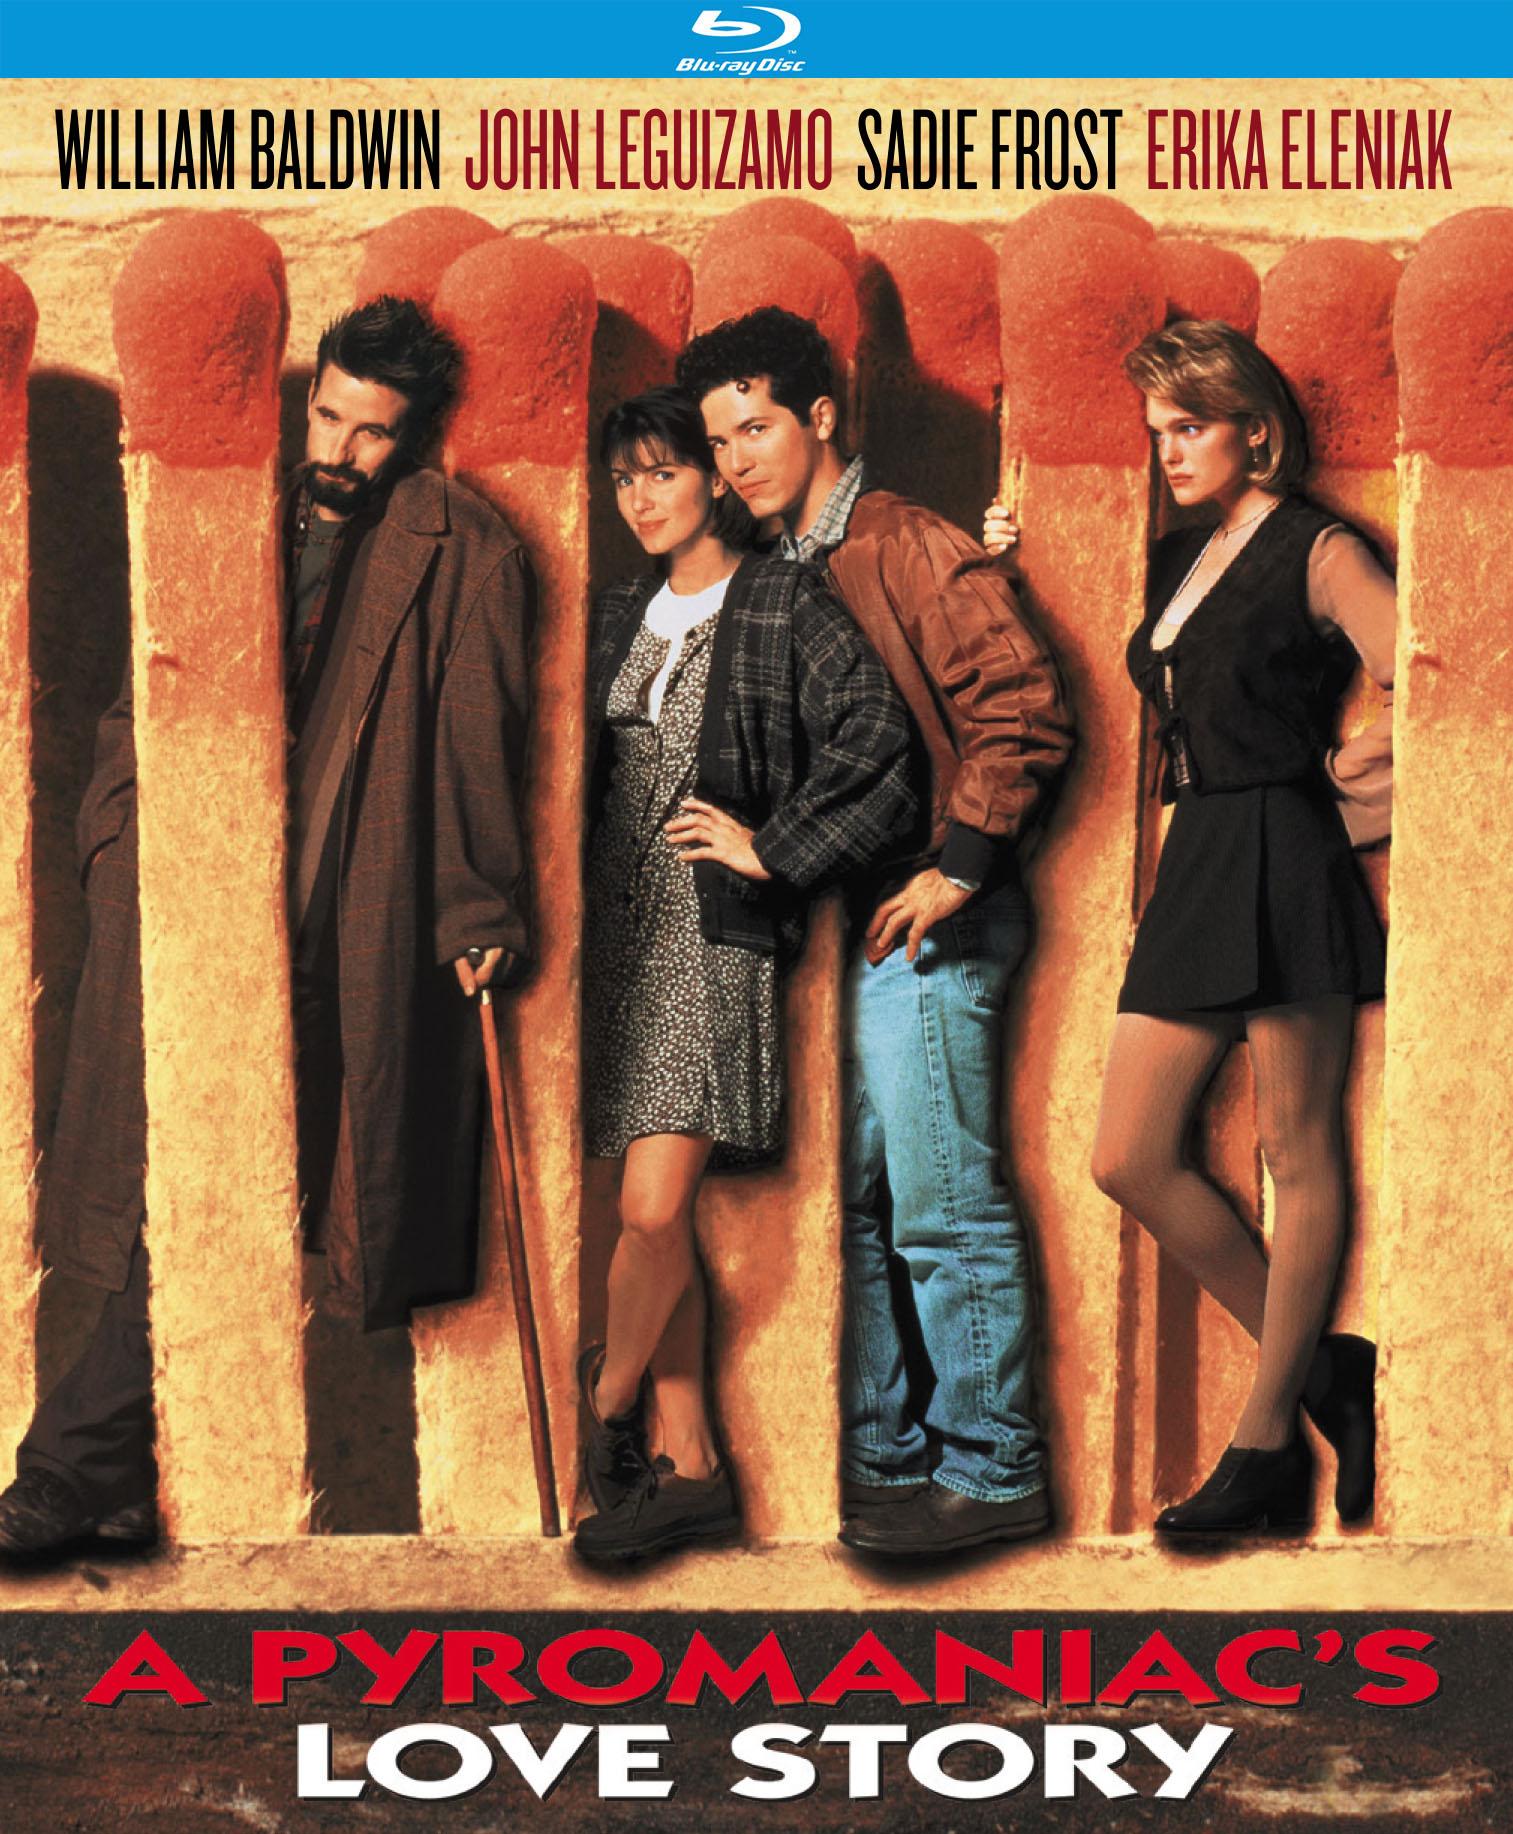 A Pyromaniac\'s Love Story (Special Edition) (Blu-ray) - Kino Lorber ...